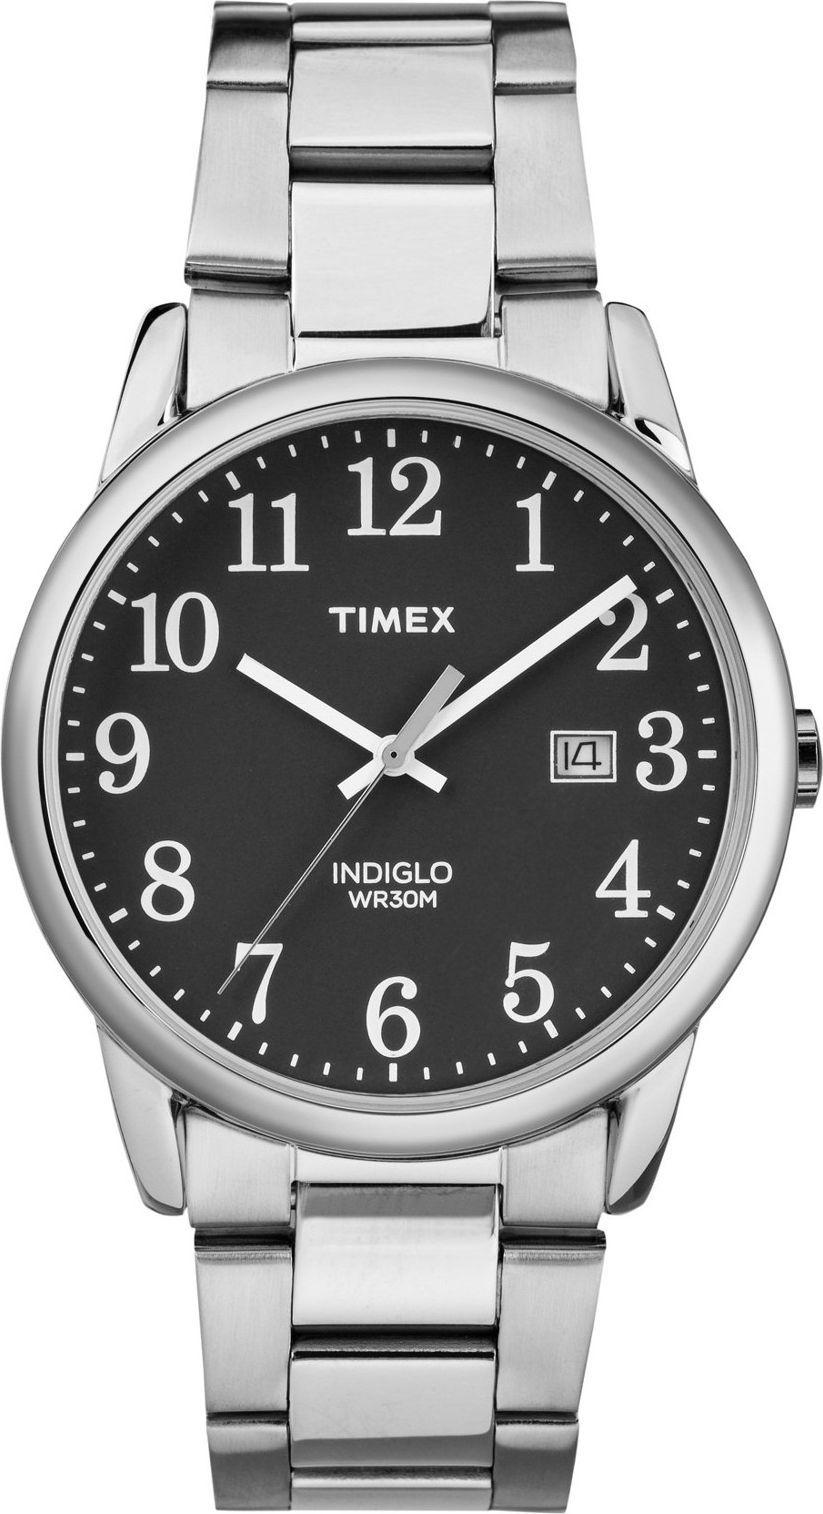 Zegarek Timex Męski TW2R23400 Easy Reader Indiglo Data 1